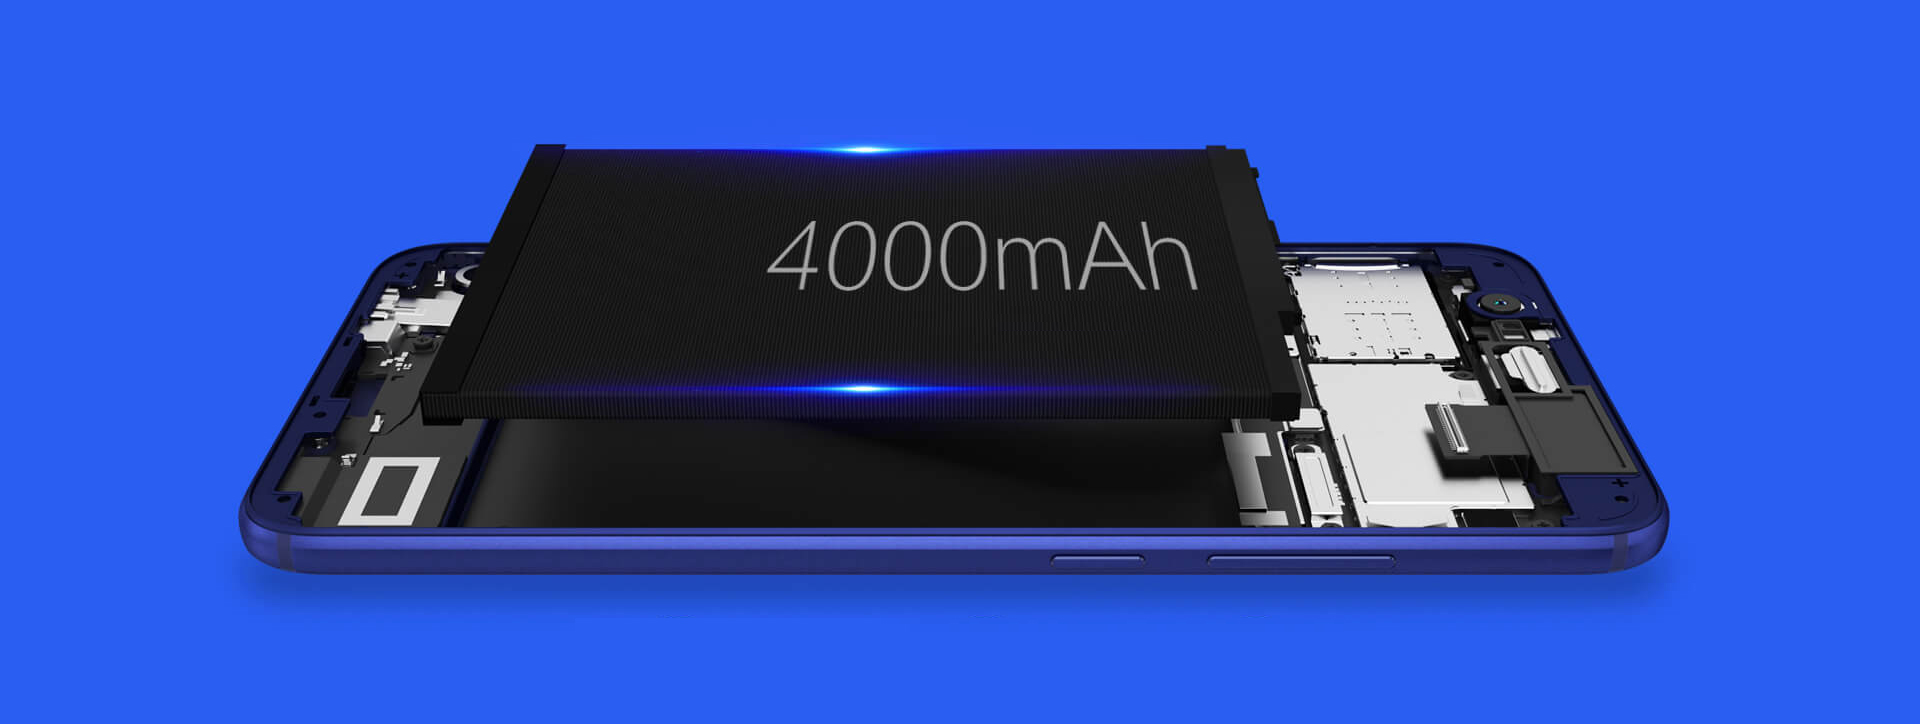 Huawei Honor 8 Pro smartpower 5.0 bateria 4000 maH